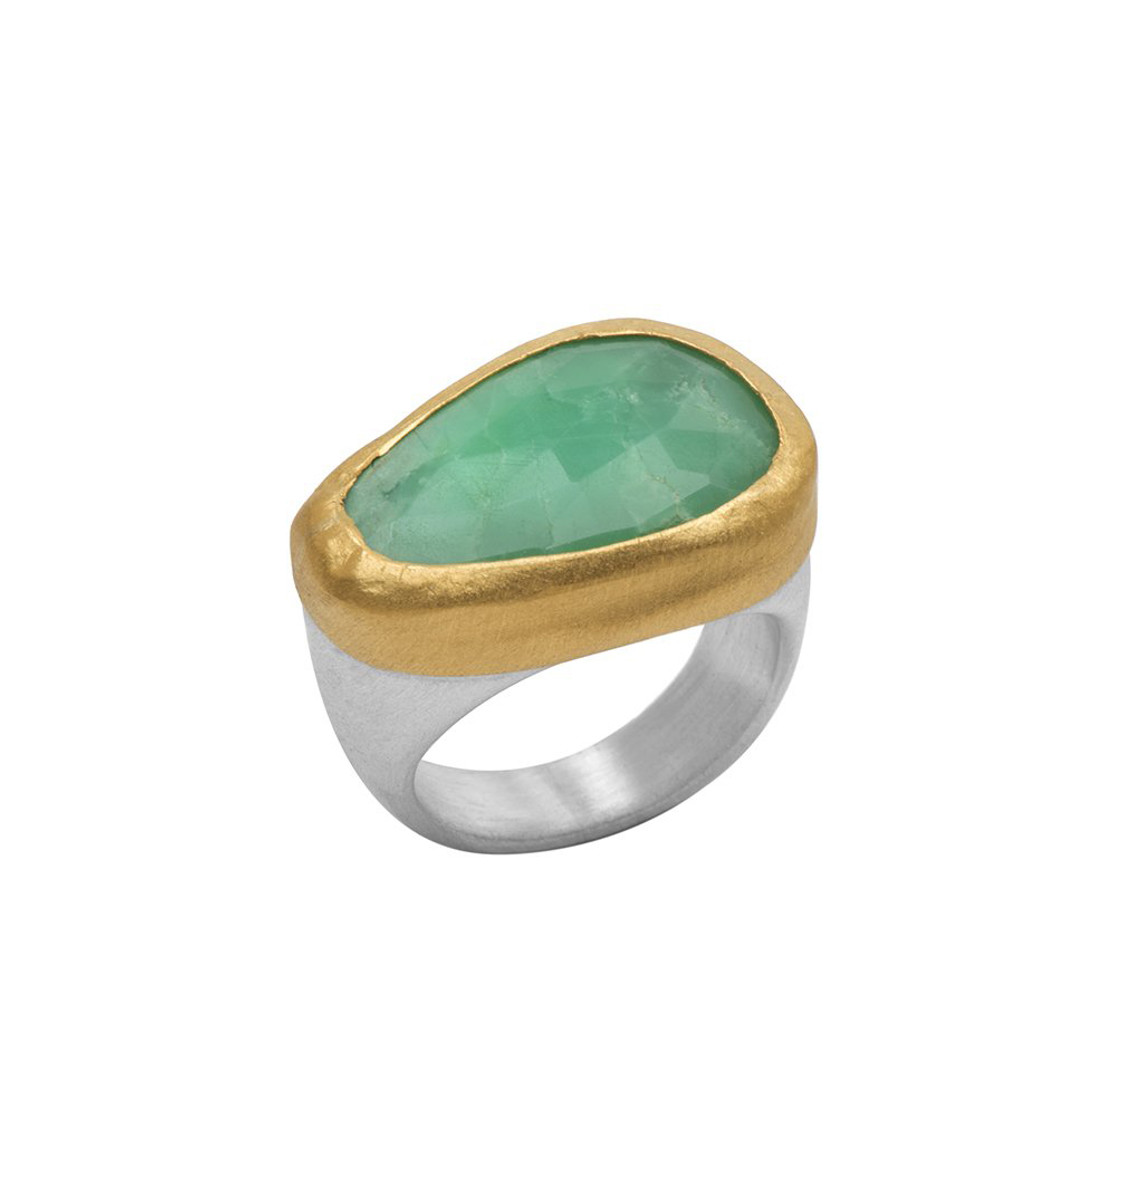 Mint Green Ring by Nava Zahavi - New Arrival